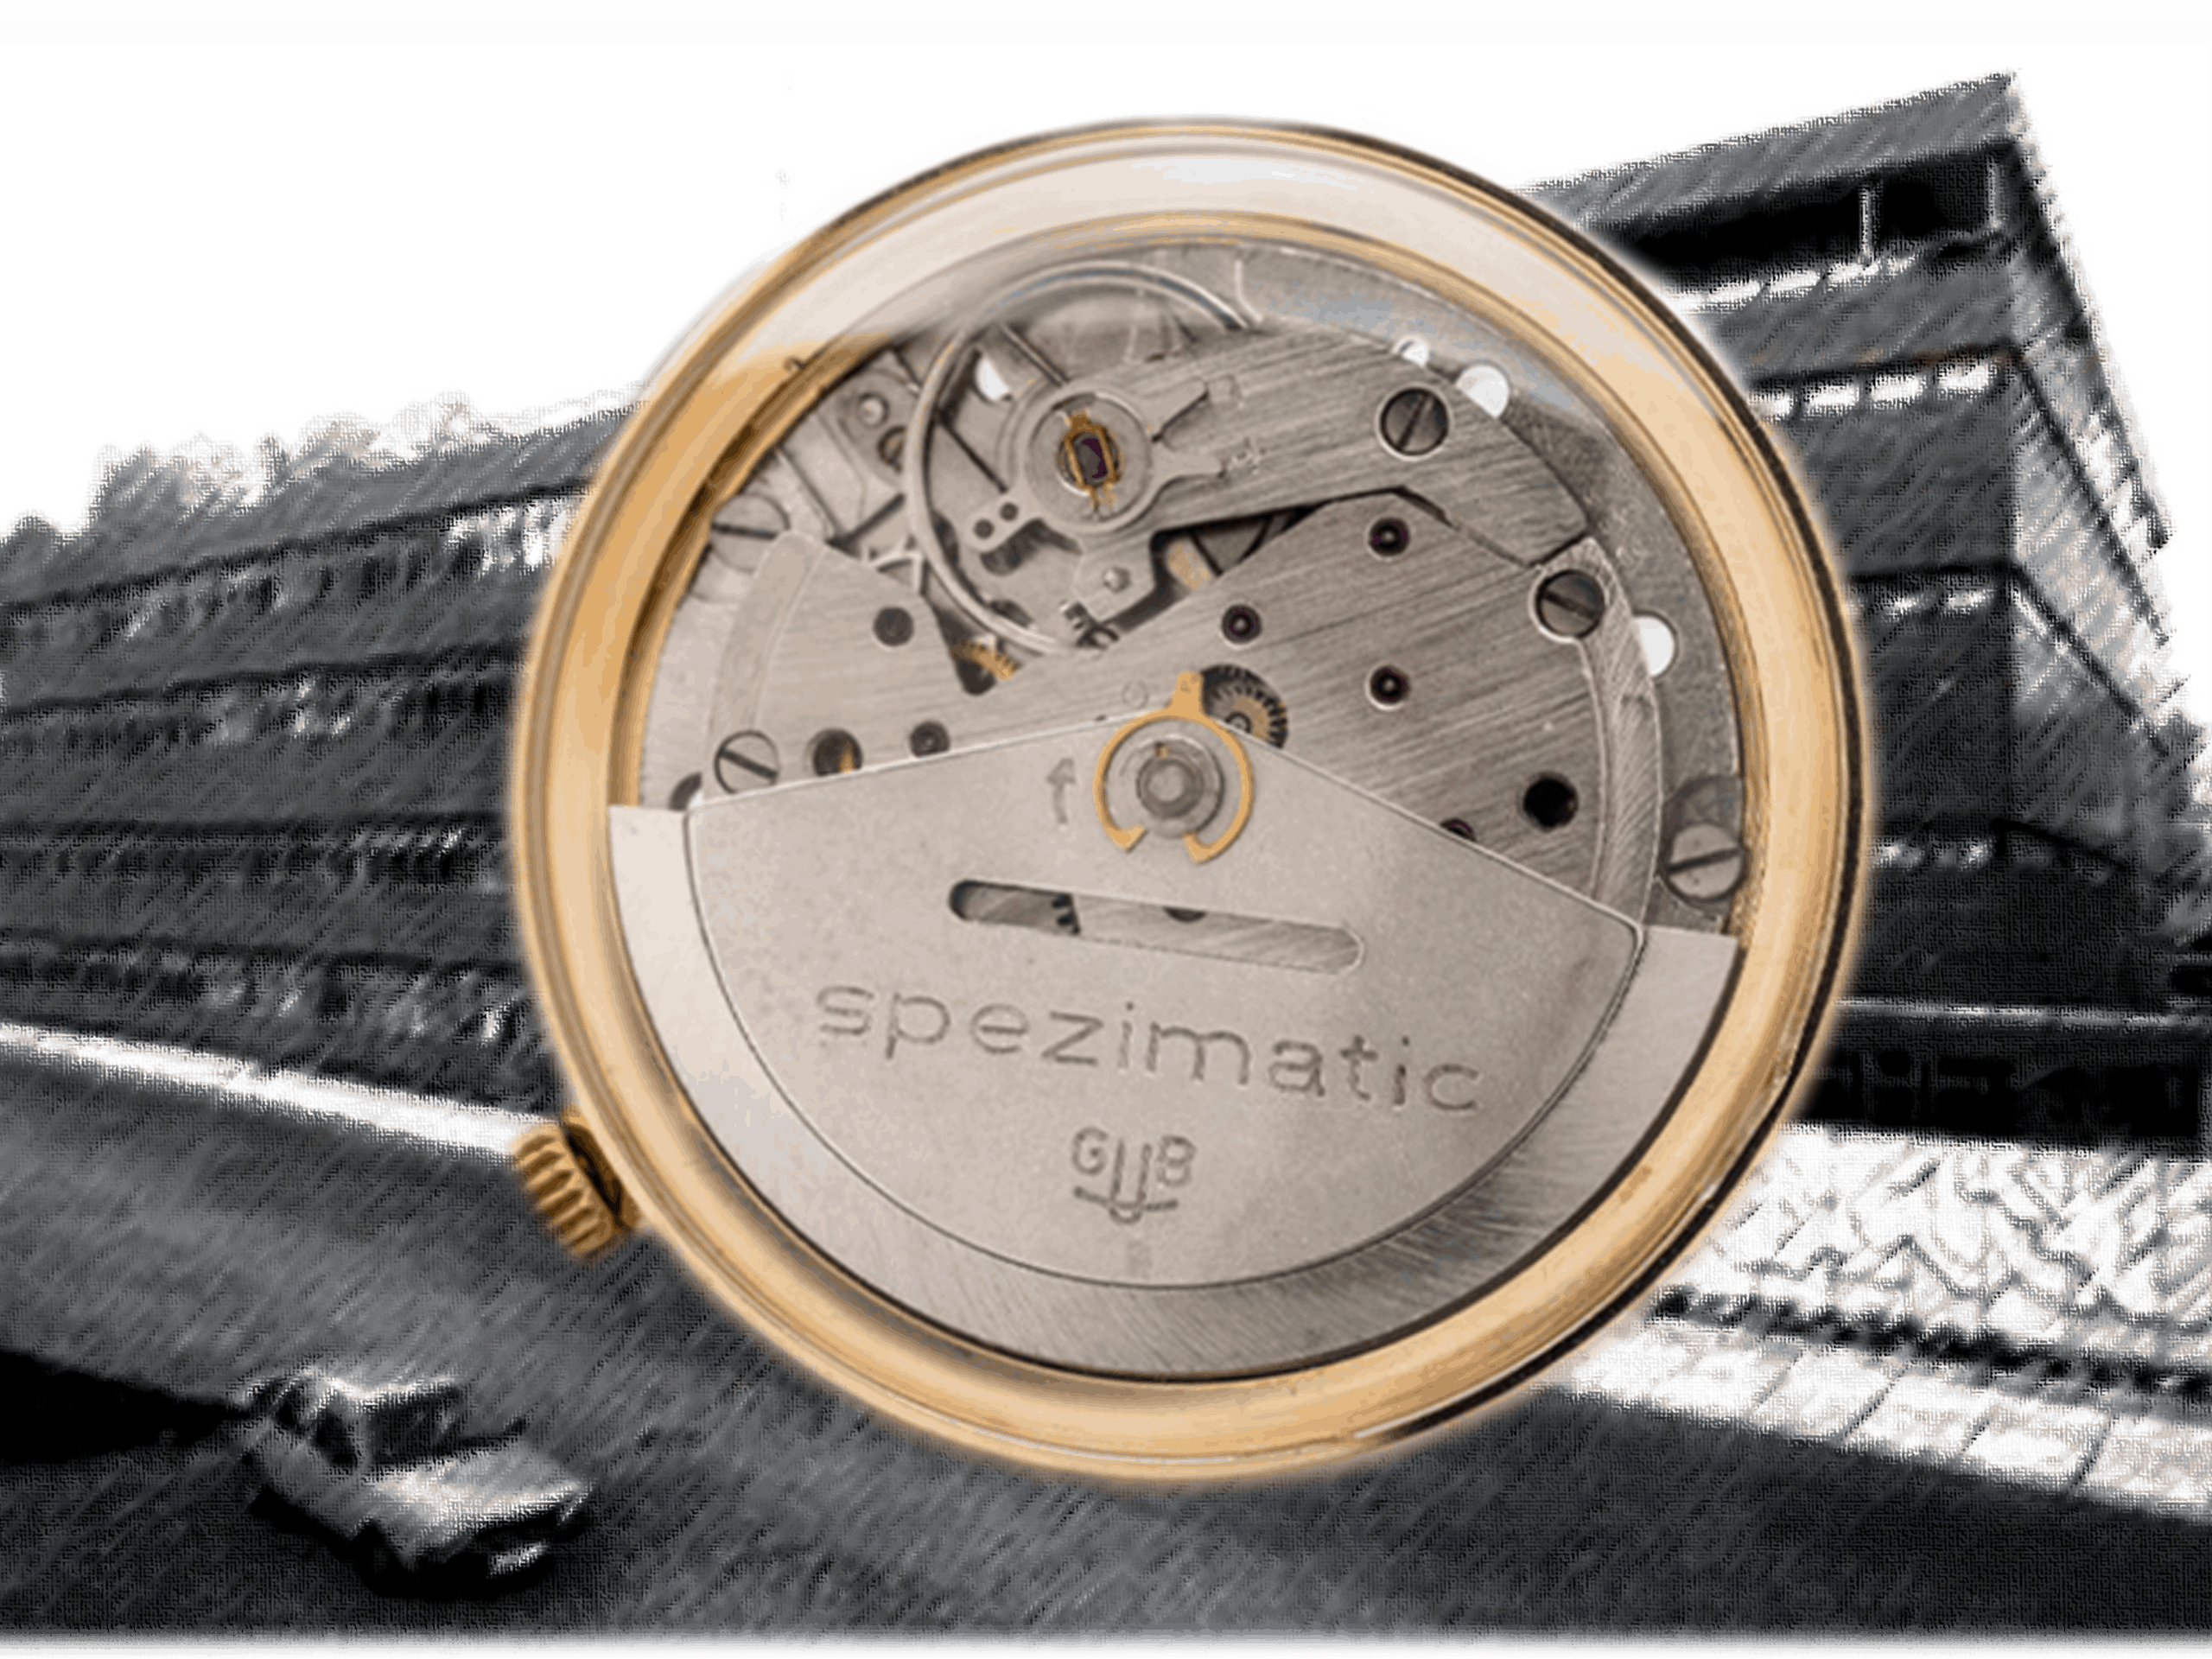 GUB Spezimatic Automatik Kaliber vor Glashütter Uhrenbetrieb